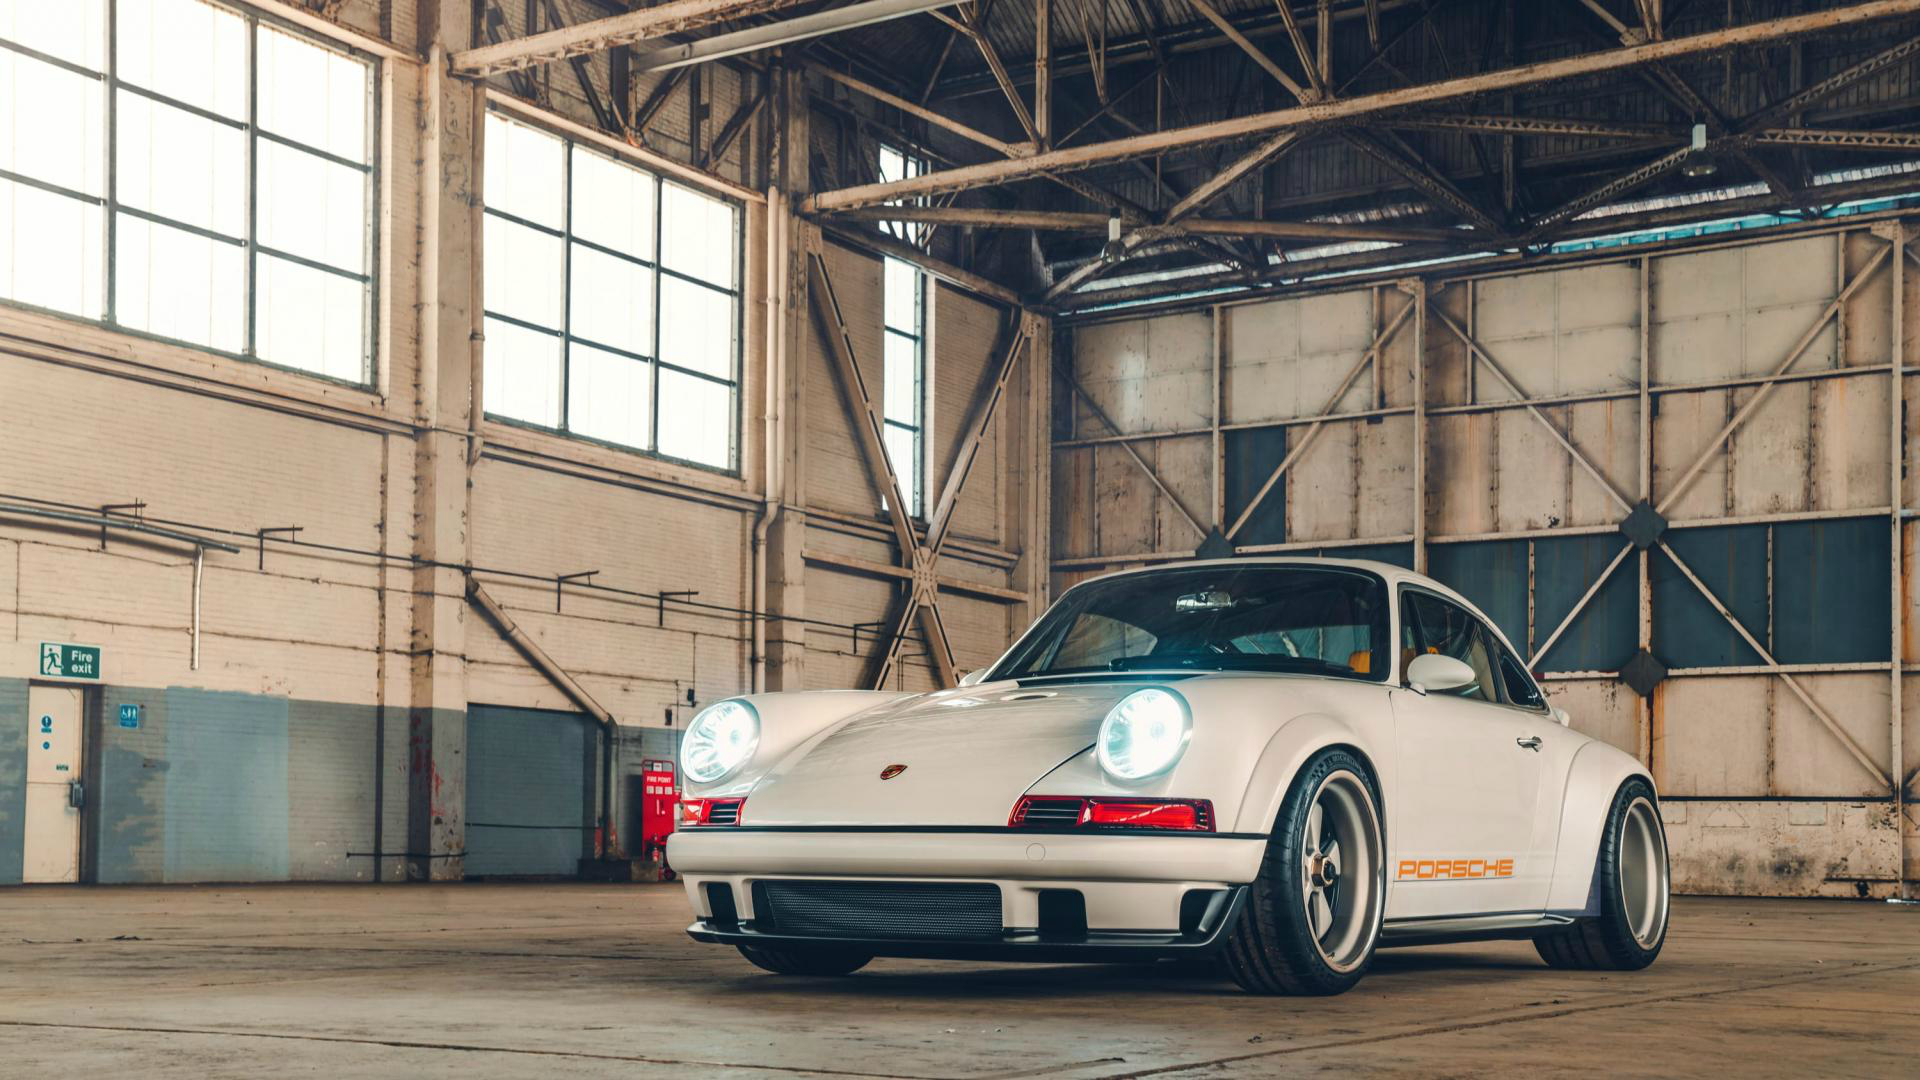 Singer Willams Dls 2018 Goodwood Festival Of Speed Fos Singer Vehicle Design Classic Porsche Dream Cars